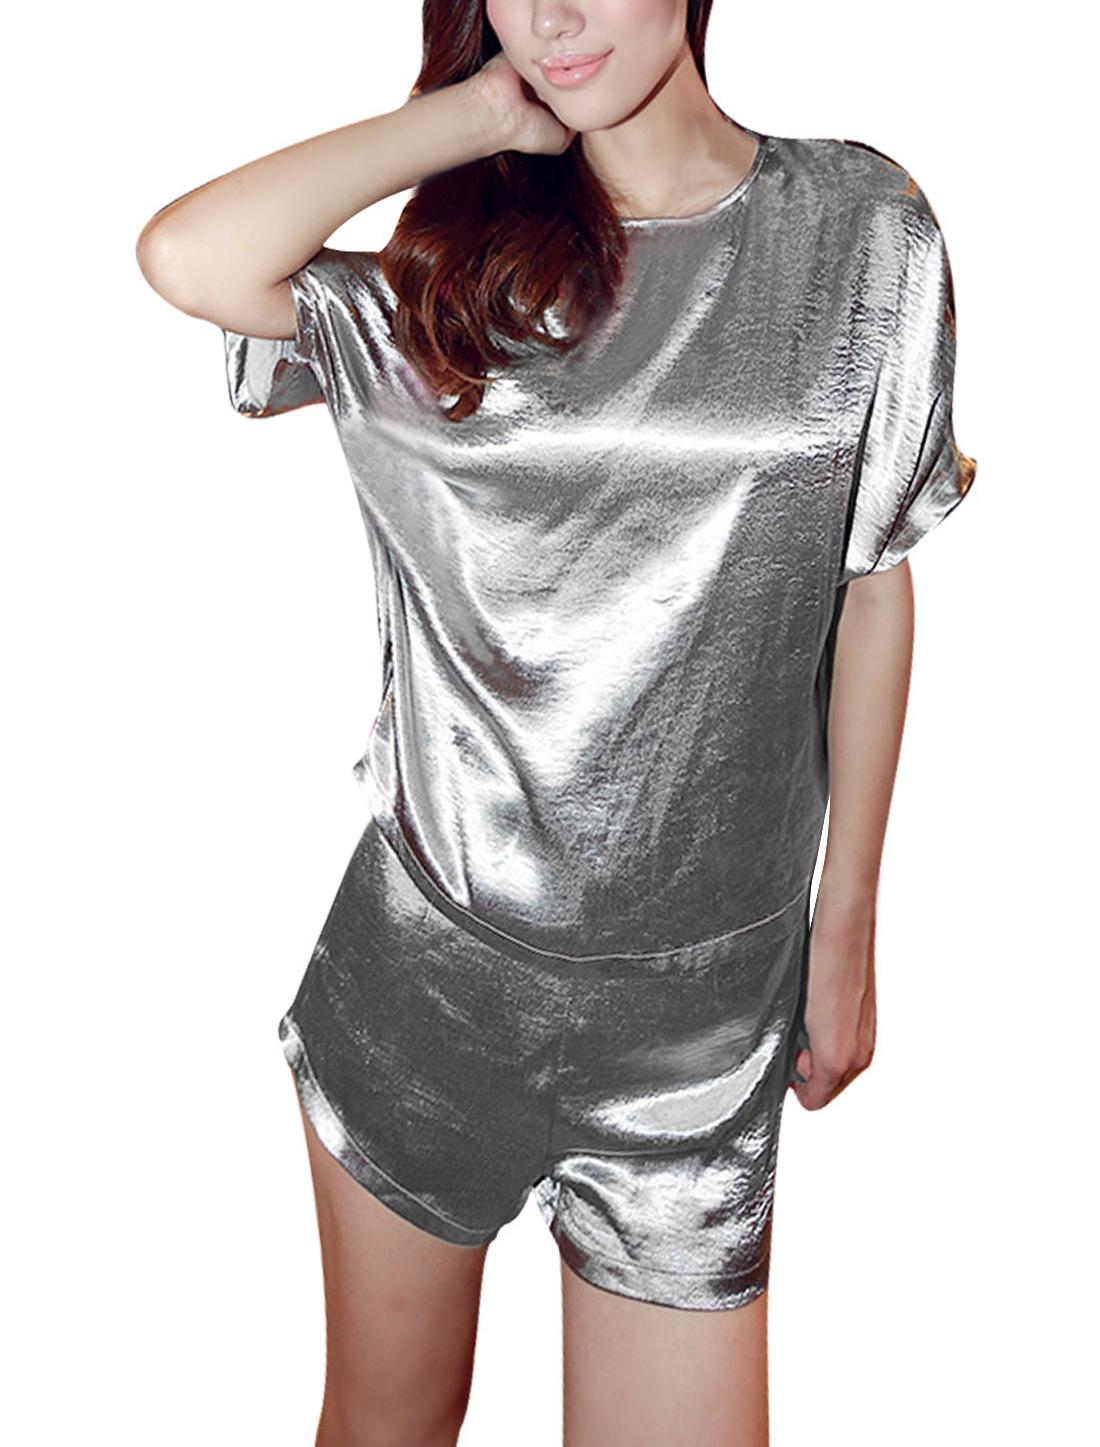 Women Hidden Zipper Back Top w Slim Fit Concealed Zipper Shorts Silver XS